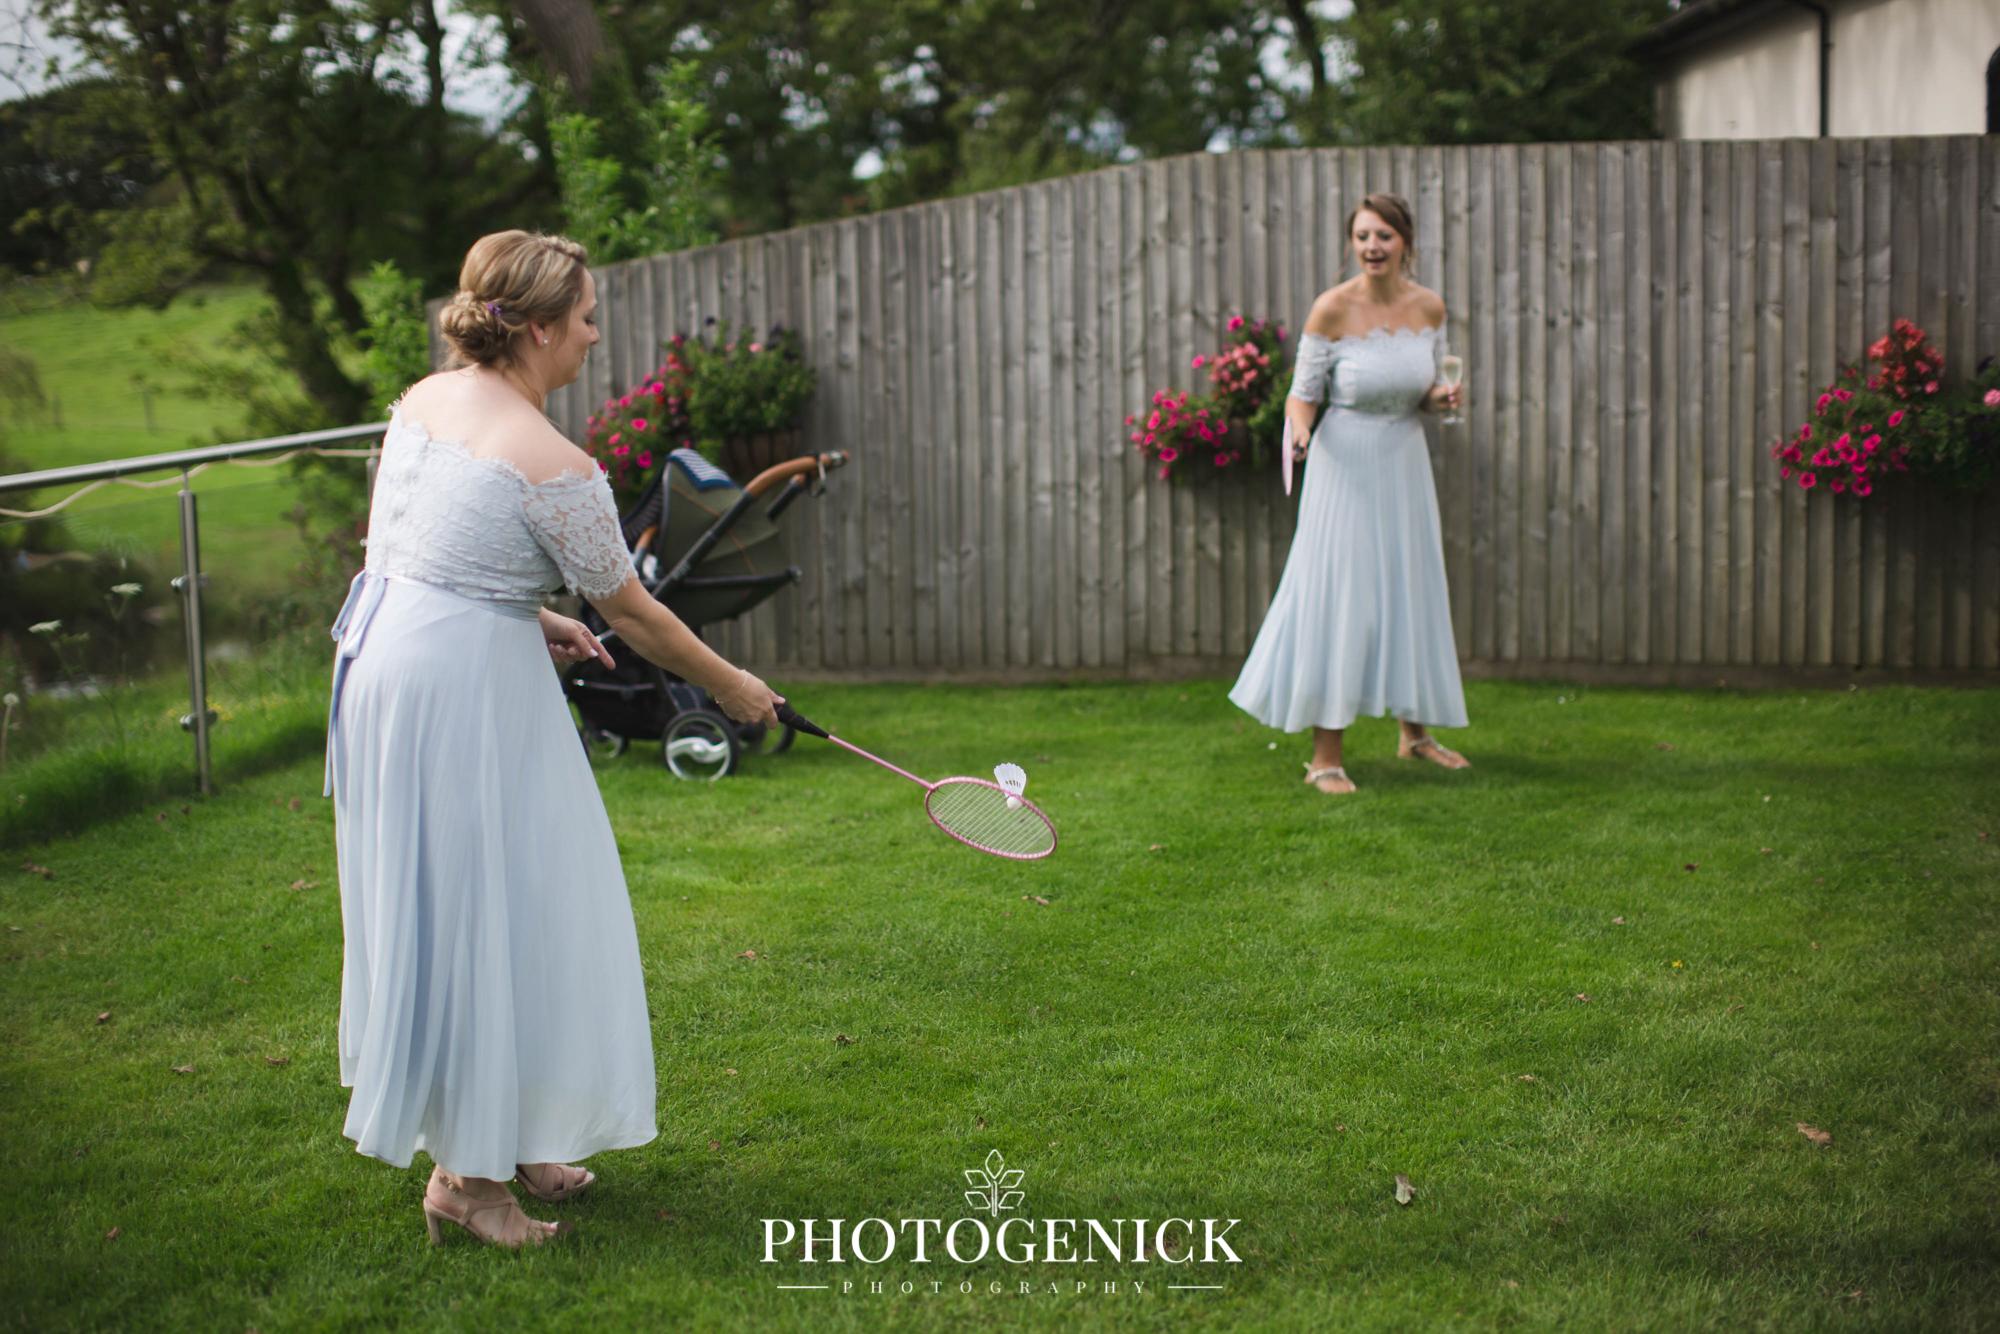 oldwalls gower wedding photographers-53.jpg